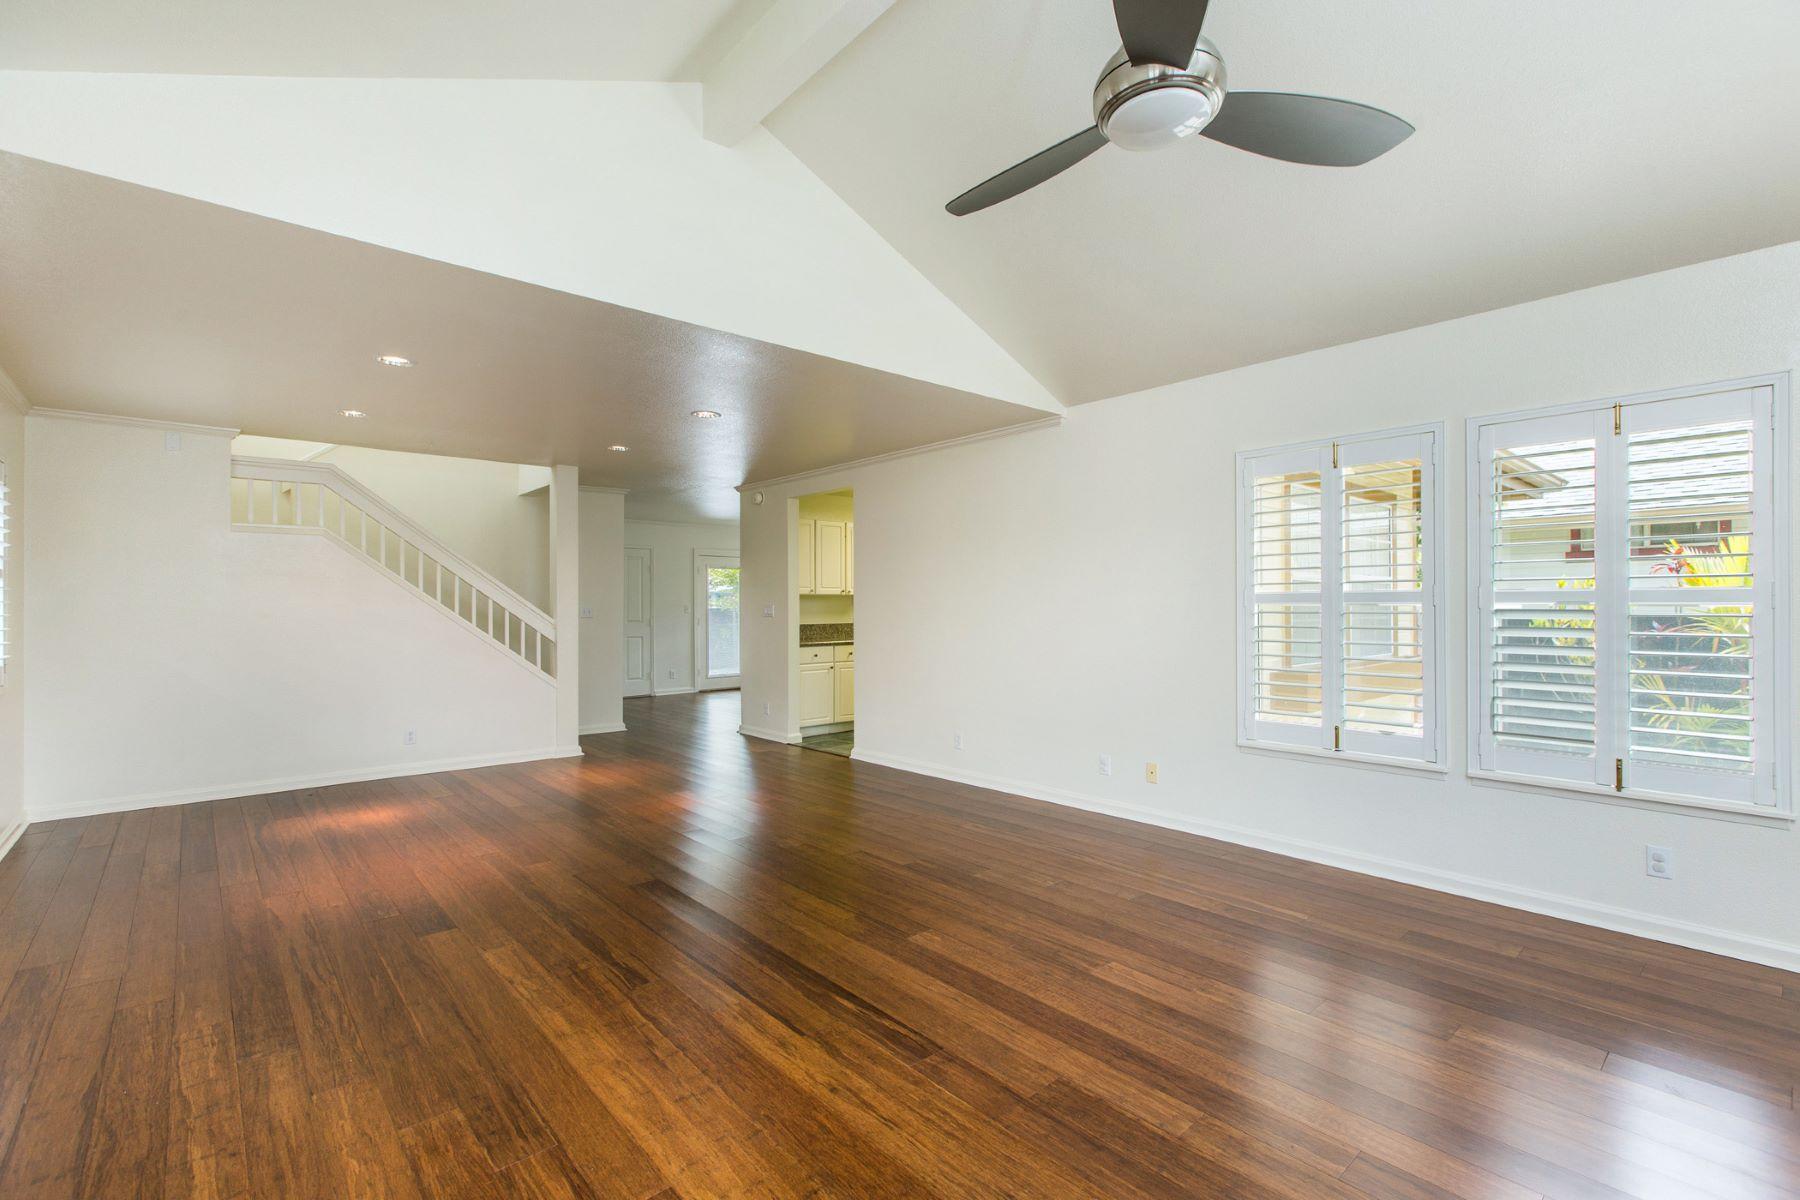 Additional photo for property listing at Mililani's Finest 95-1003 Puulu Street Mililani, Hawaii 96789 United States